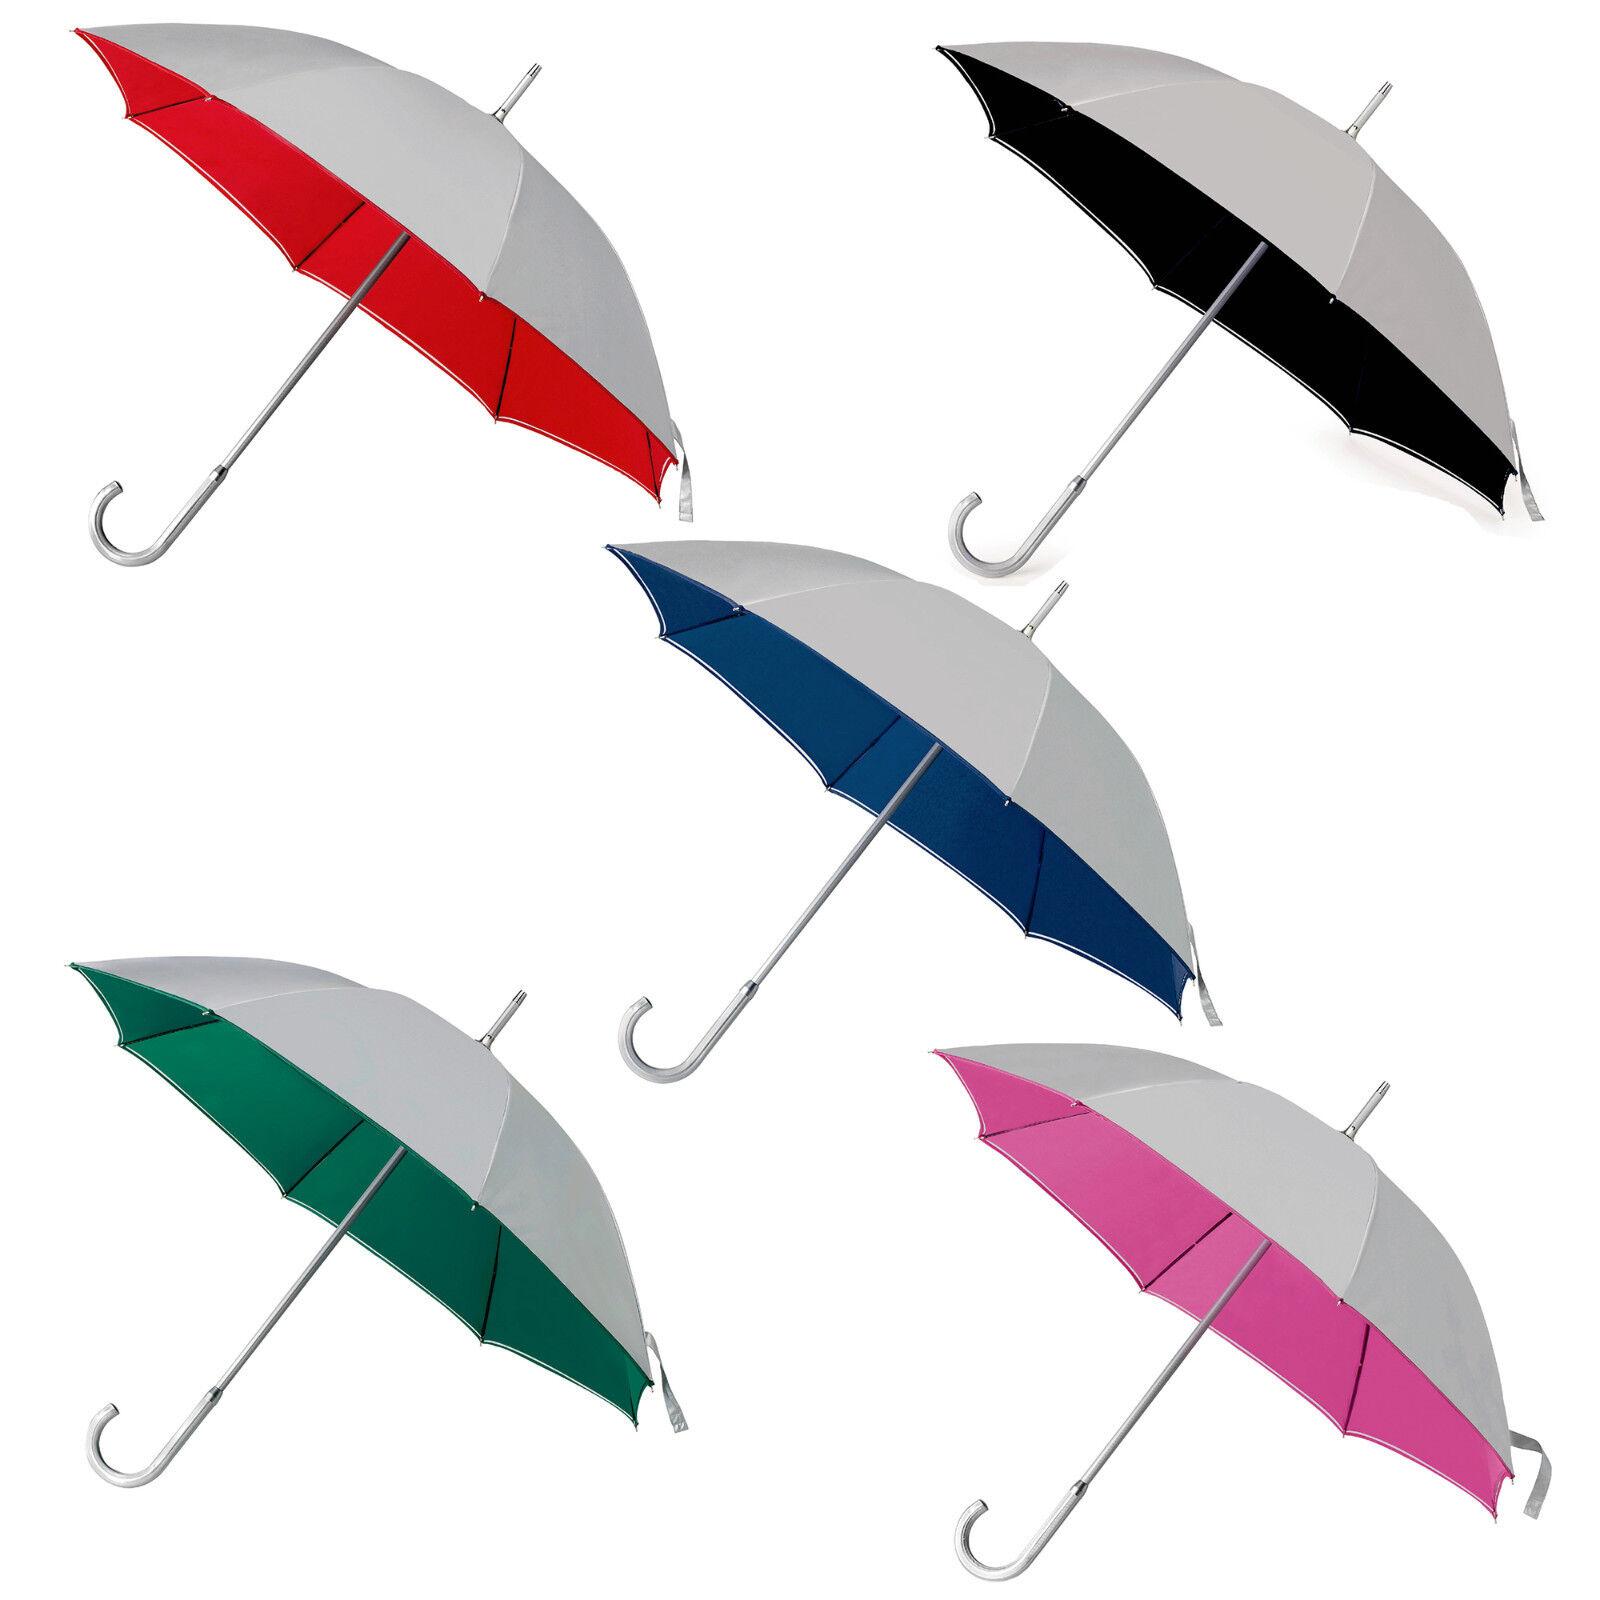 3 duo coloured silver classic manual umbrellas with an aluminium handle 104 cm